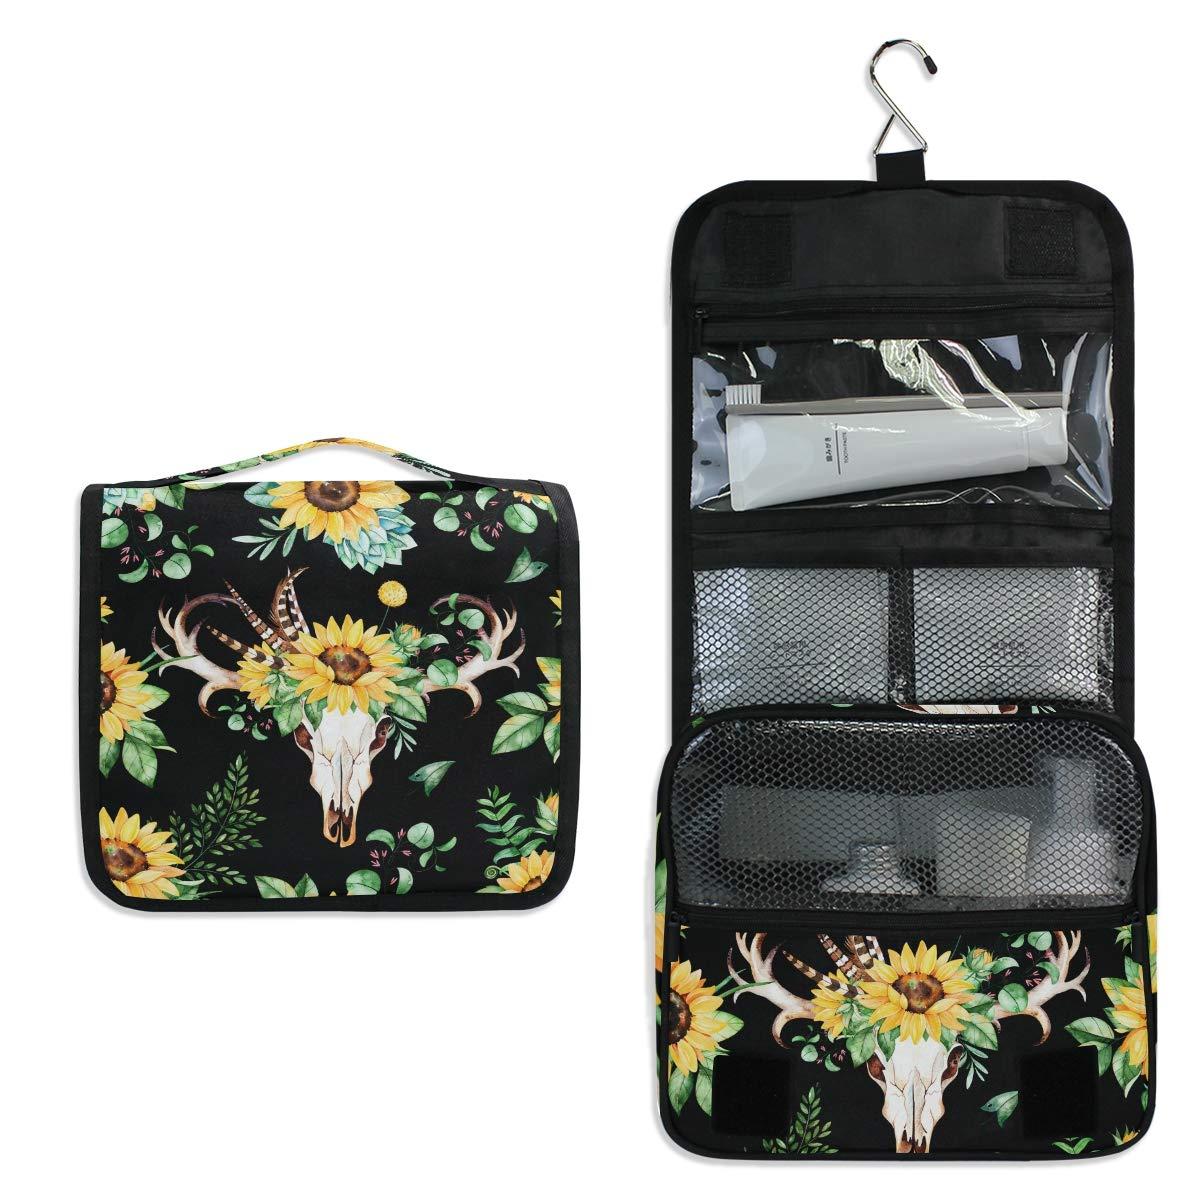 Toiletry Bag Travel Bag Hanging Hook - Sunflowers Leaves Skull Horns Waterproof Cosmetic Bag Portable Makeup Pouch for Toiletries Bathroom